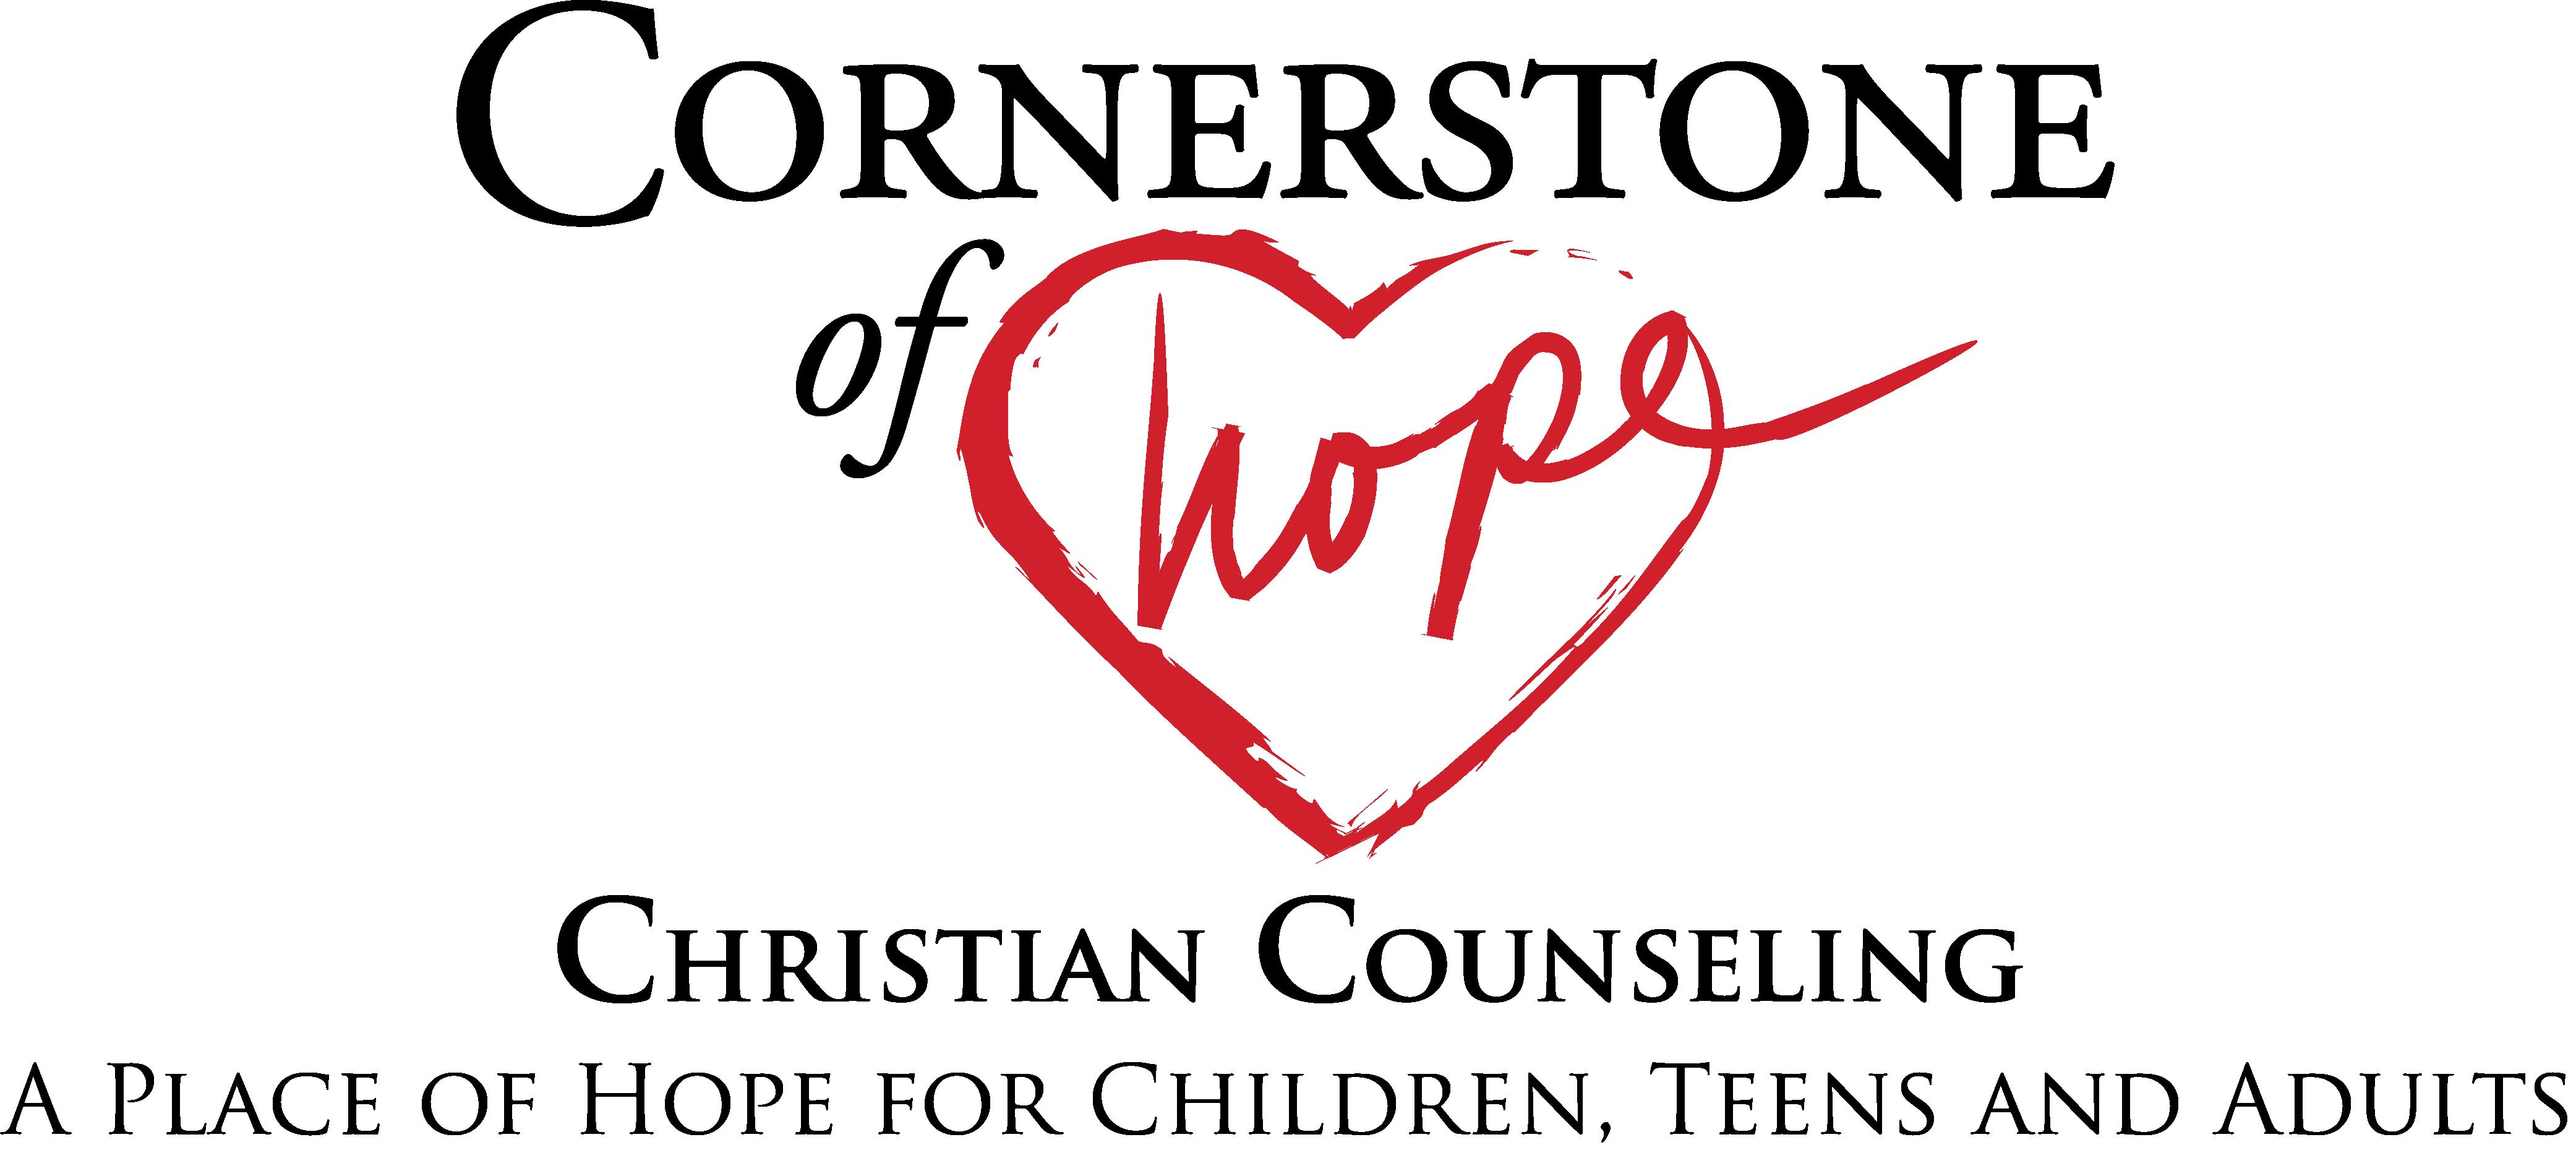 2-Cornerstone-of-Hope-Logo.png